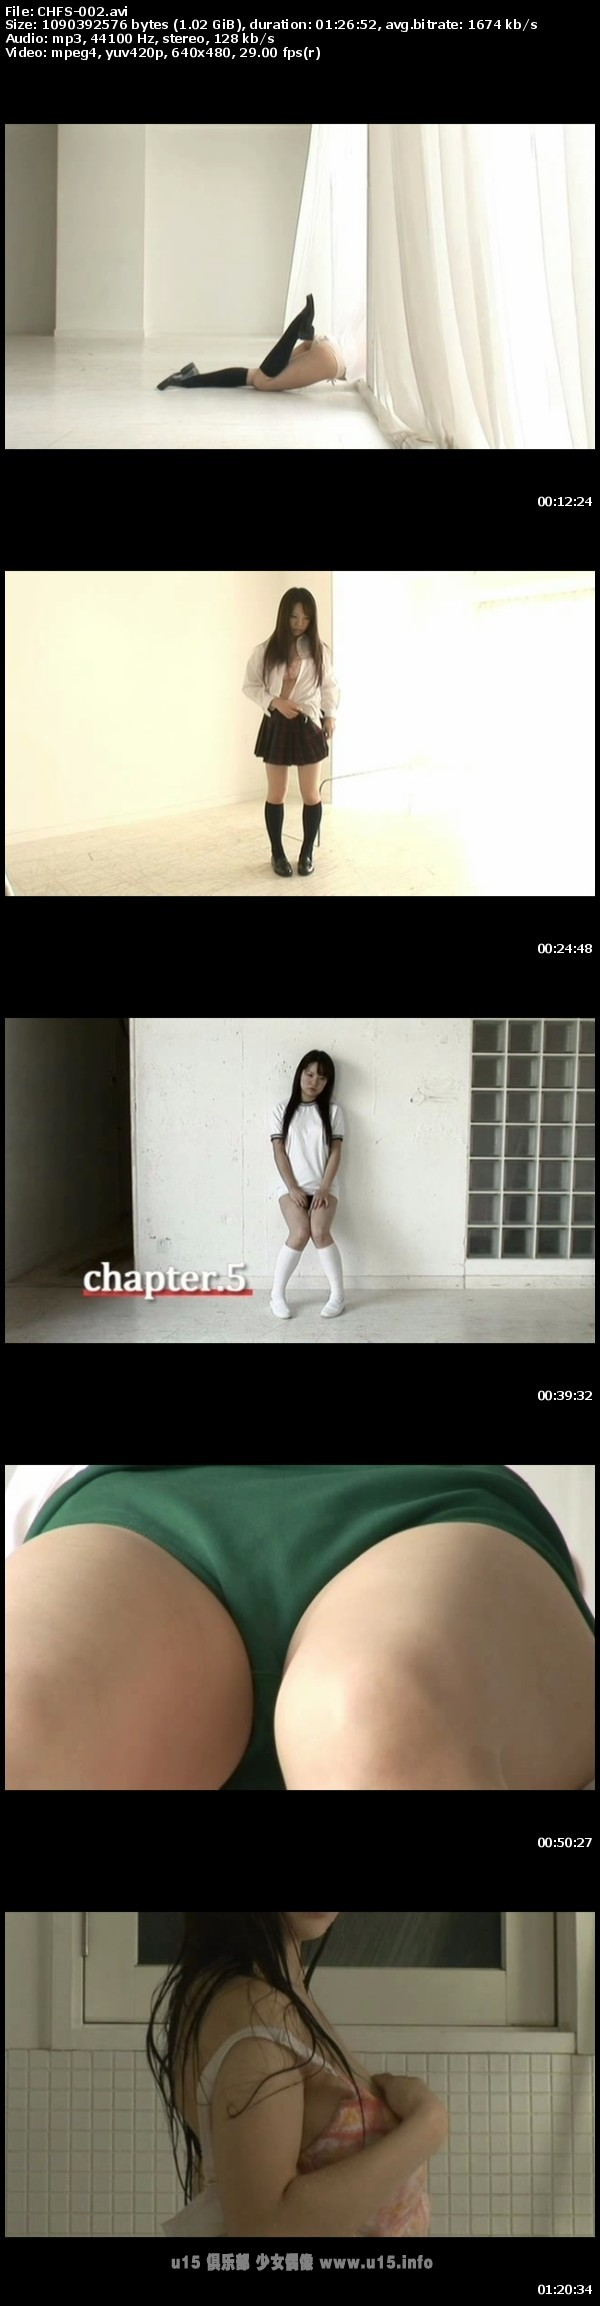 CHFS-002_s.jpg